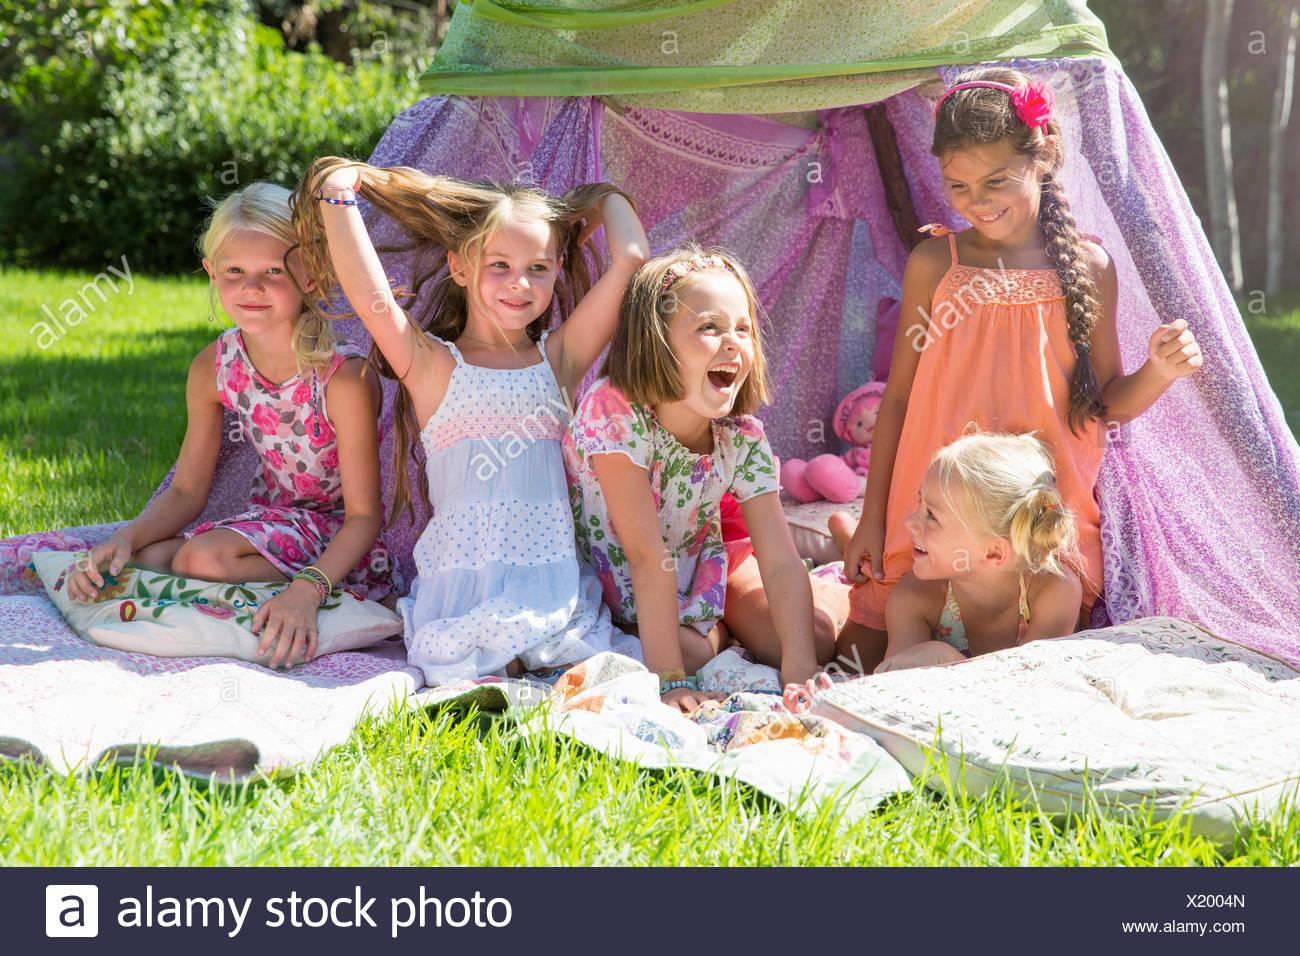 Fünf Mädchen spielen im Garten Tipi Stockbild